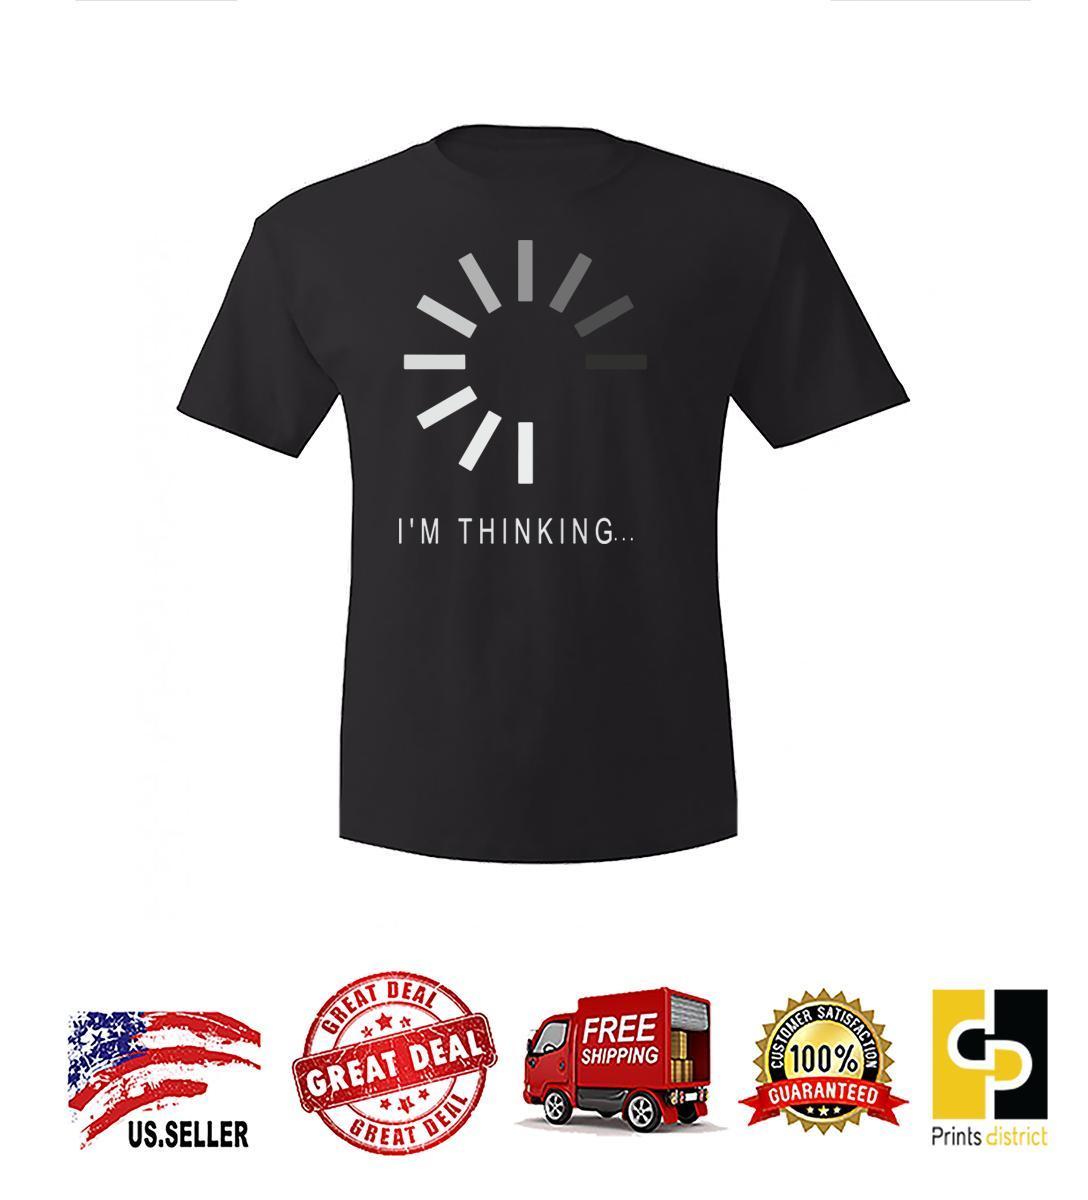 5ef9e002d573 Prints District I'm Thinking Short Sleeve Funny Graphic Mens Uni-Sex T-Shirt  New 2018 Hot Summer Men's T-shirt Cool